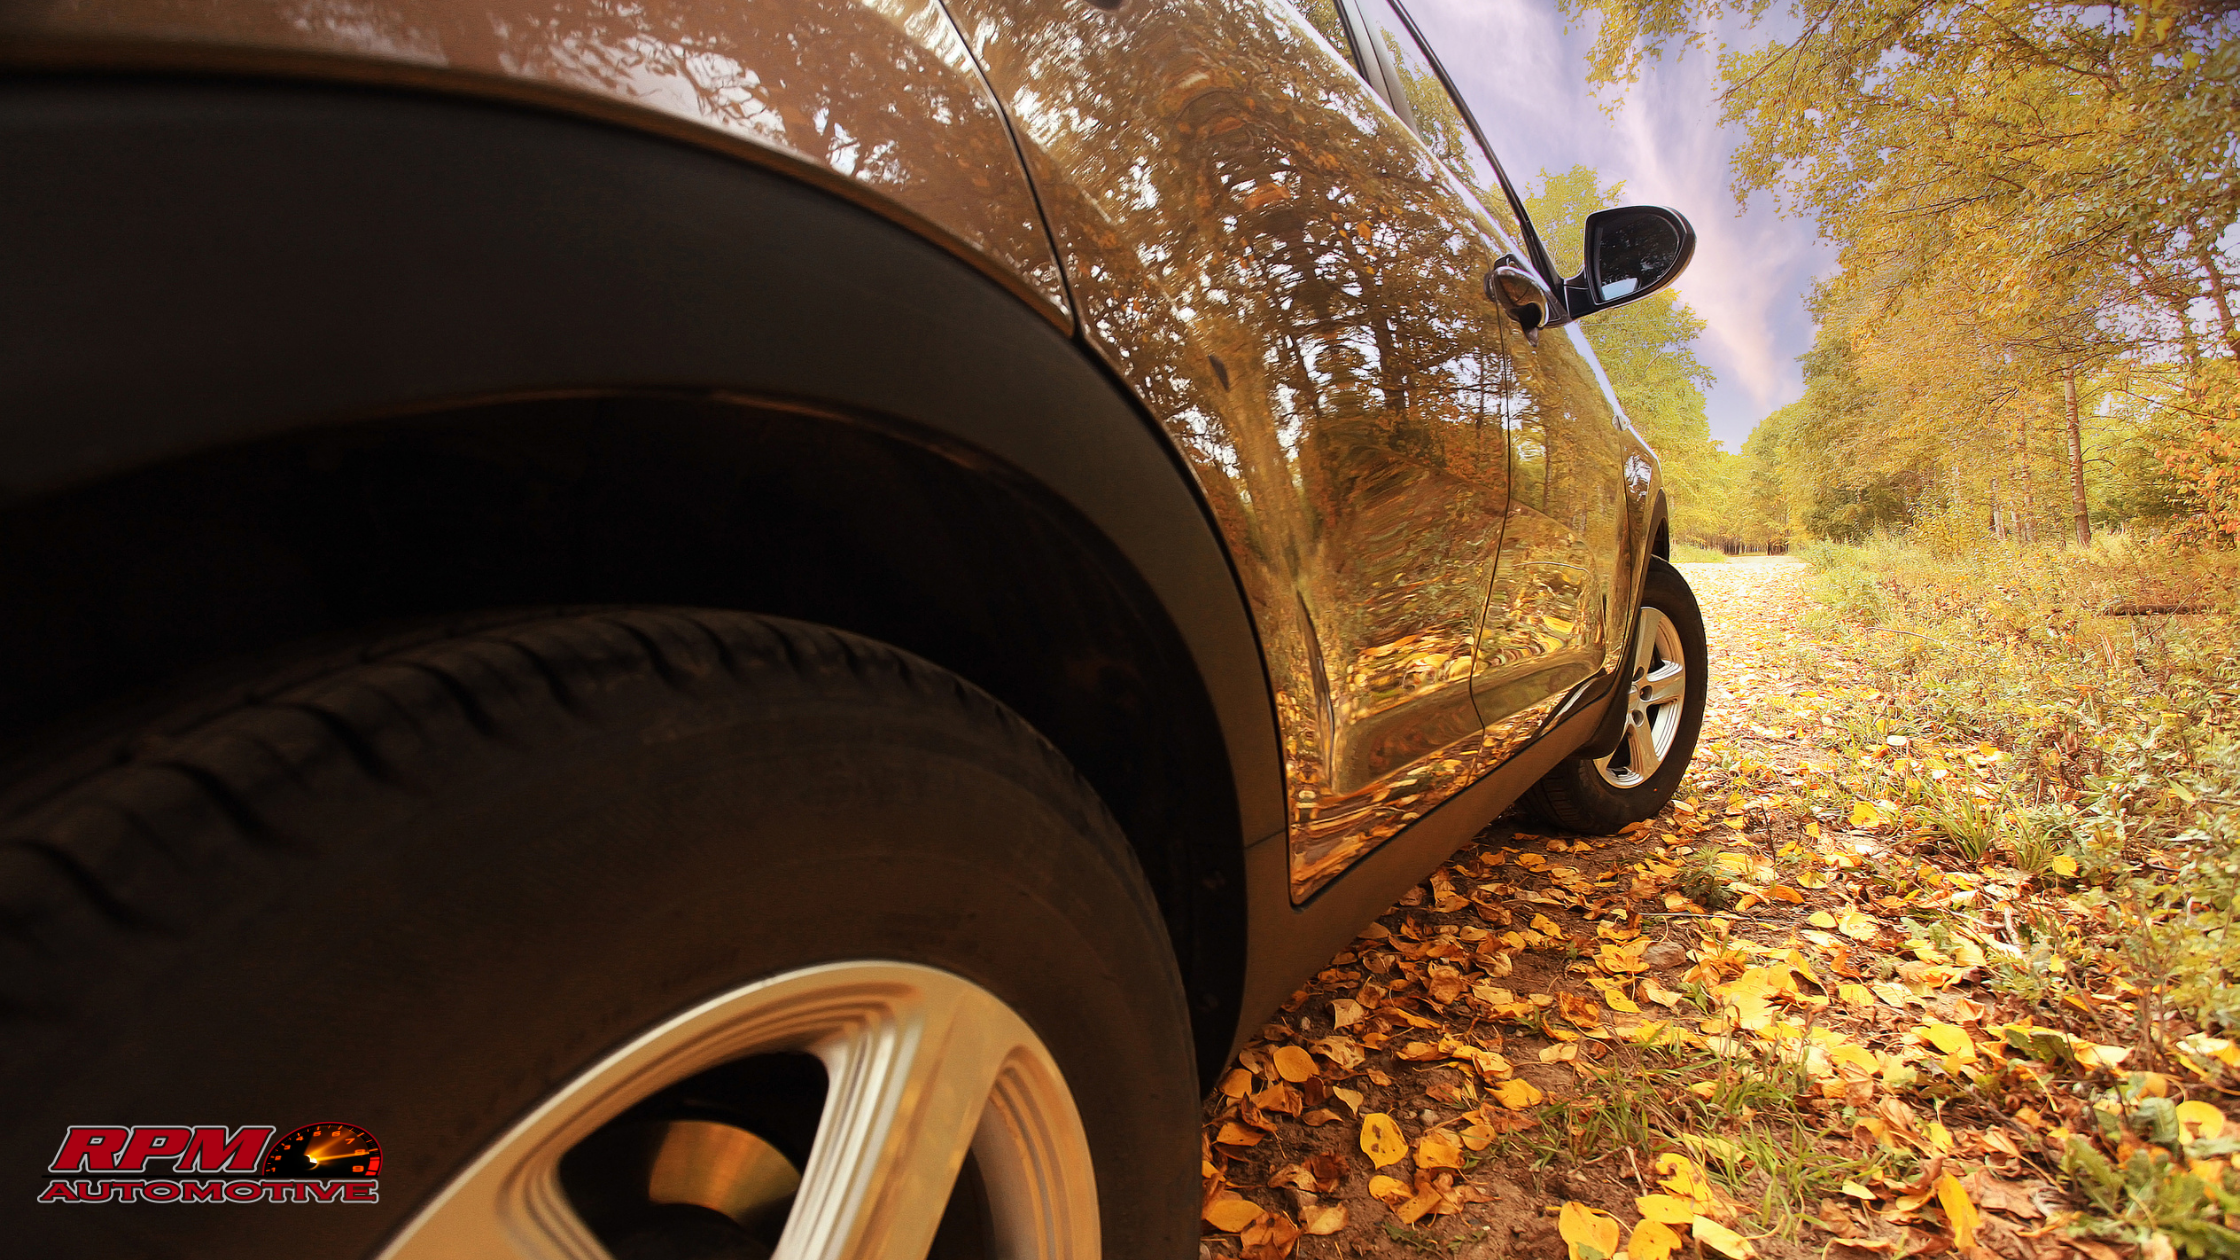 Three Fall Car Care Ideas To Consider